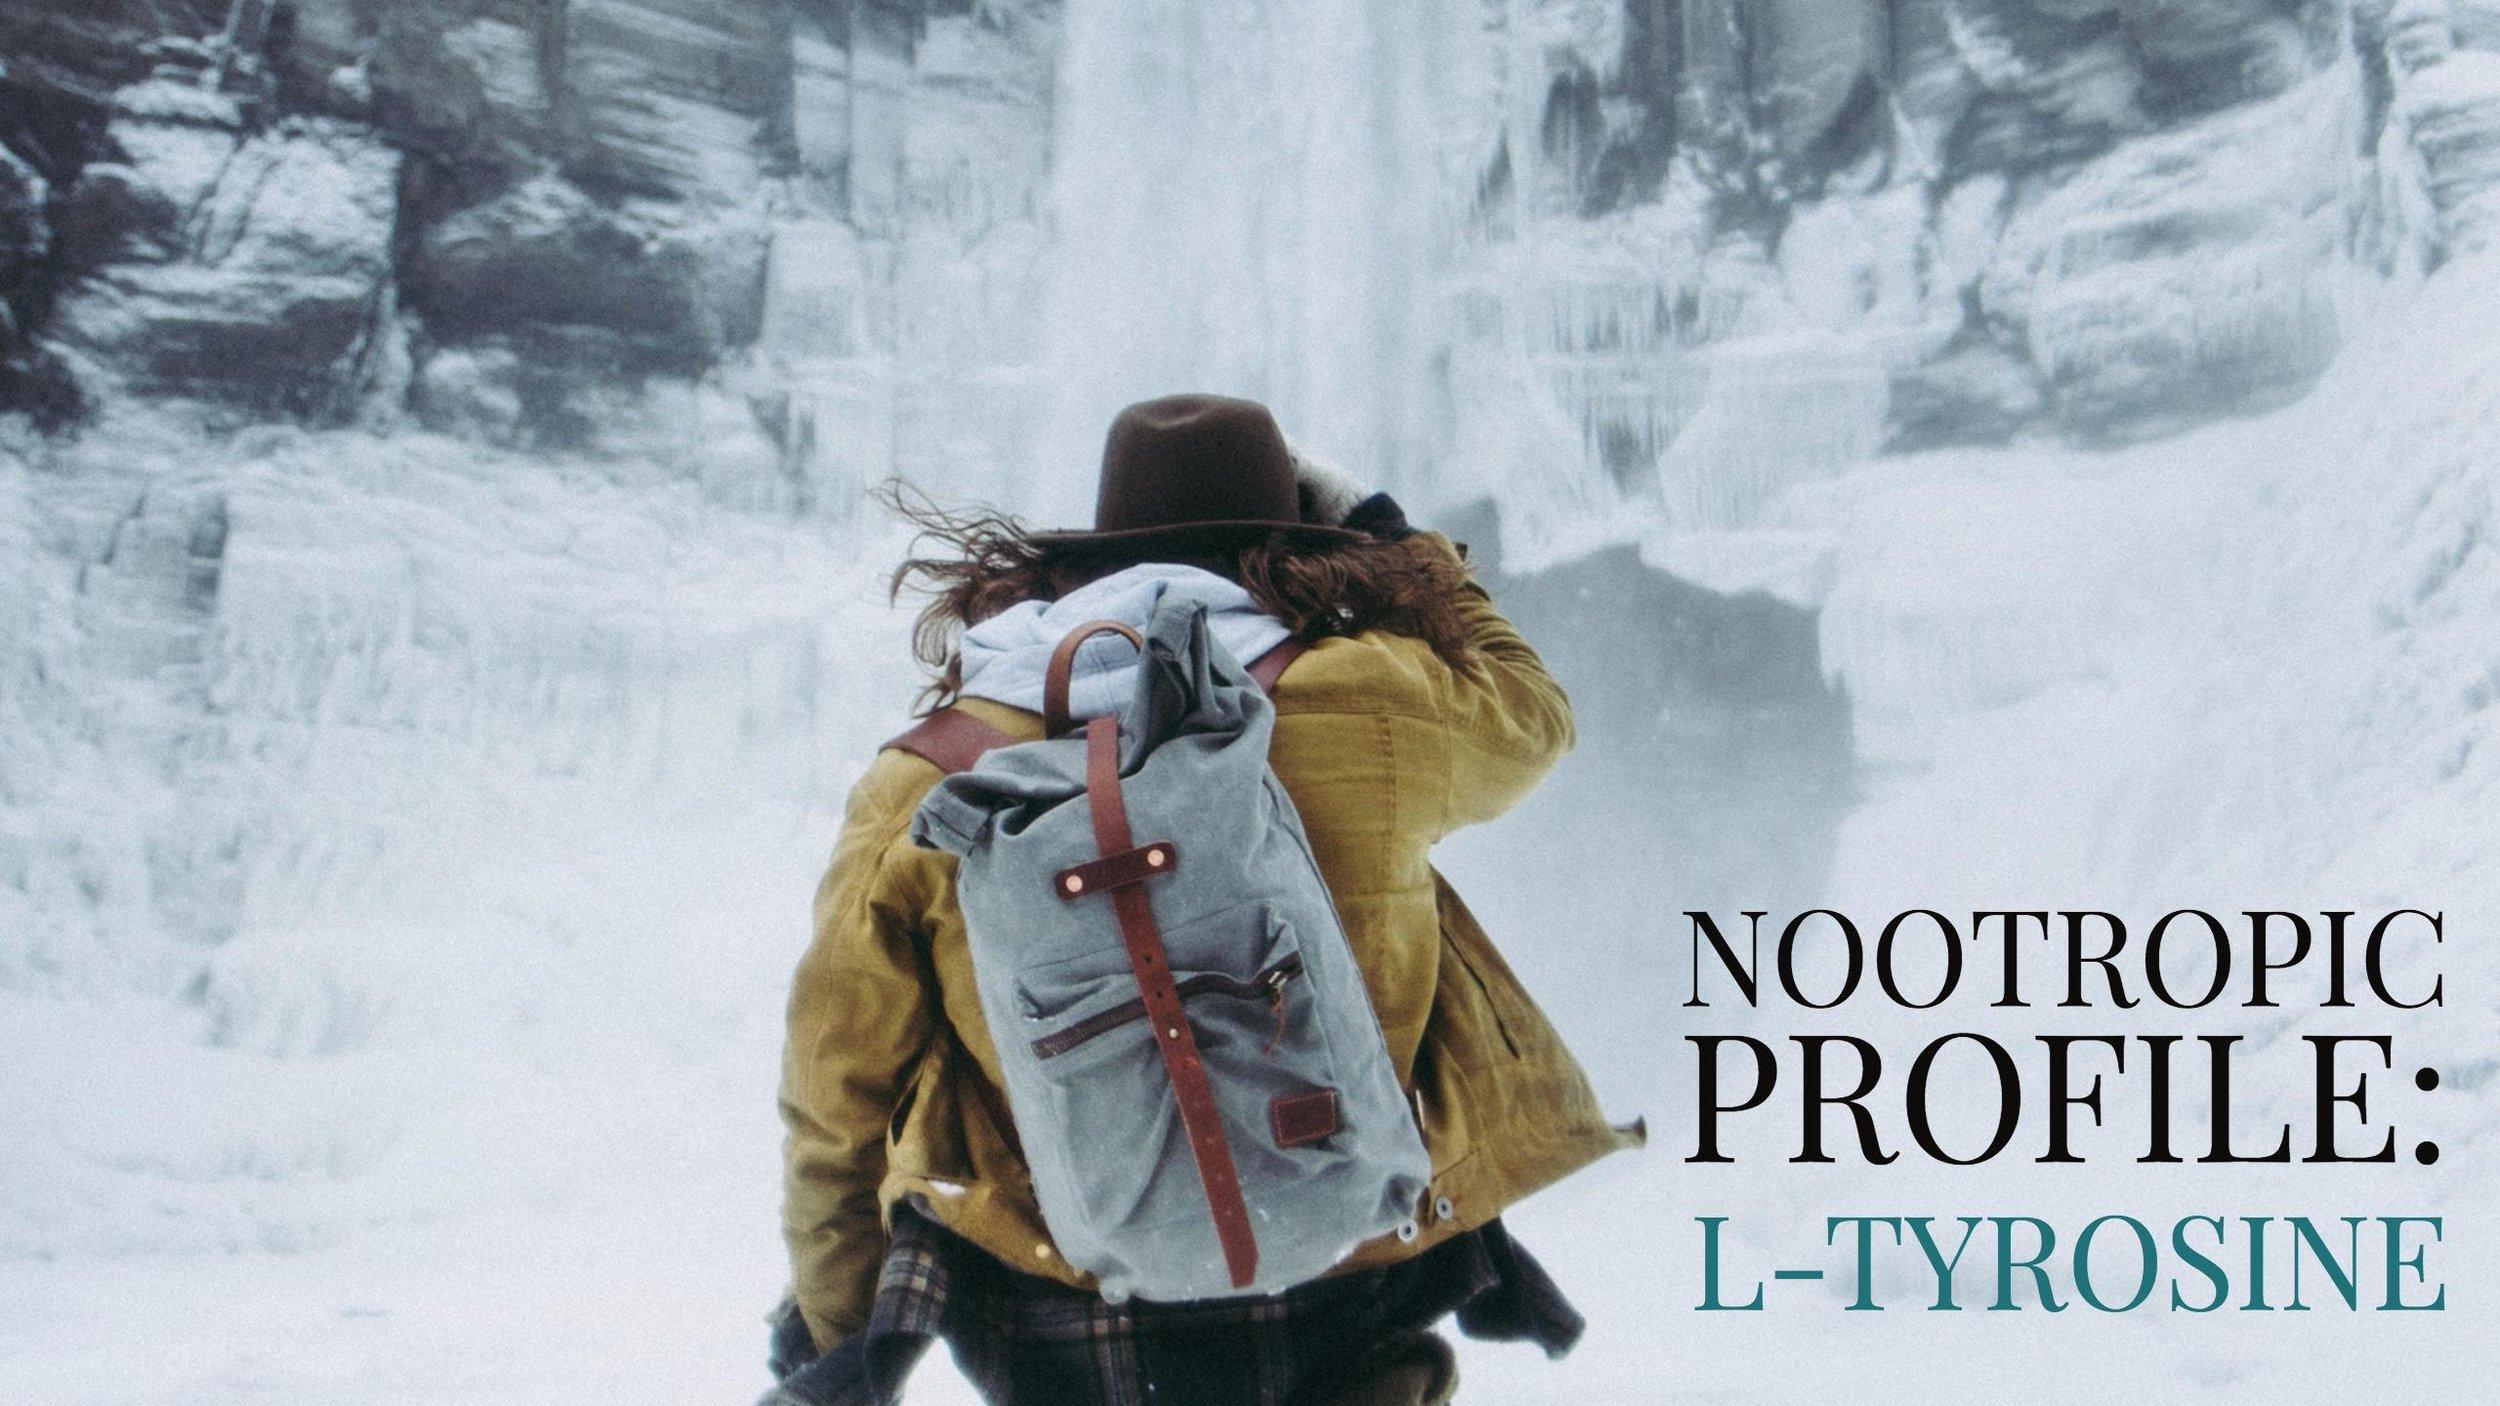 nootropic l-tyrosine article